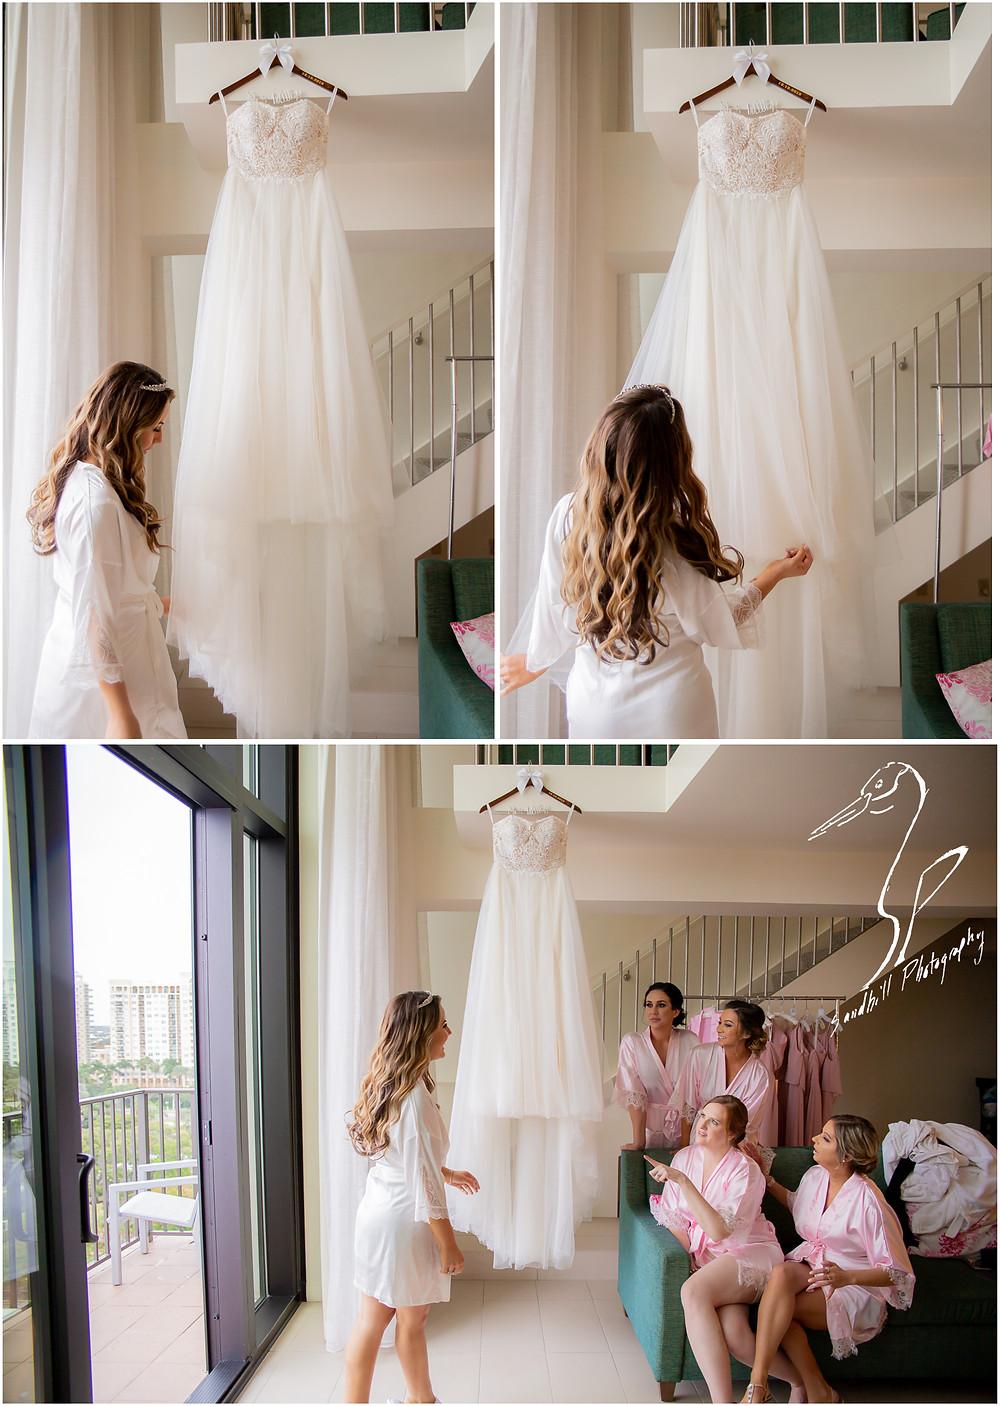 Sarasota Beach Wedding Photography, Bride getting ready to put on her dress at Hyatt Regency Sarasota